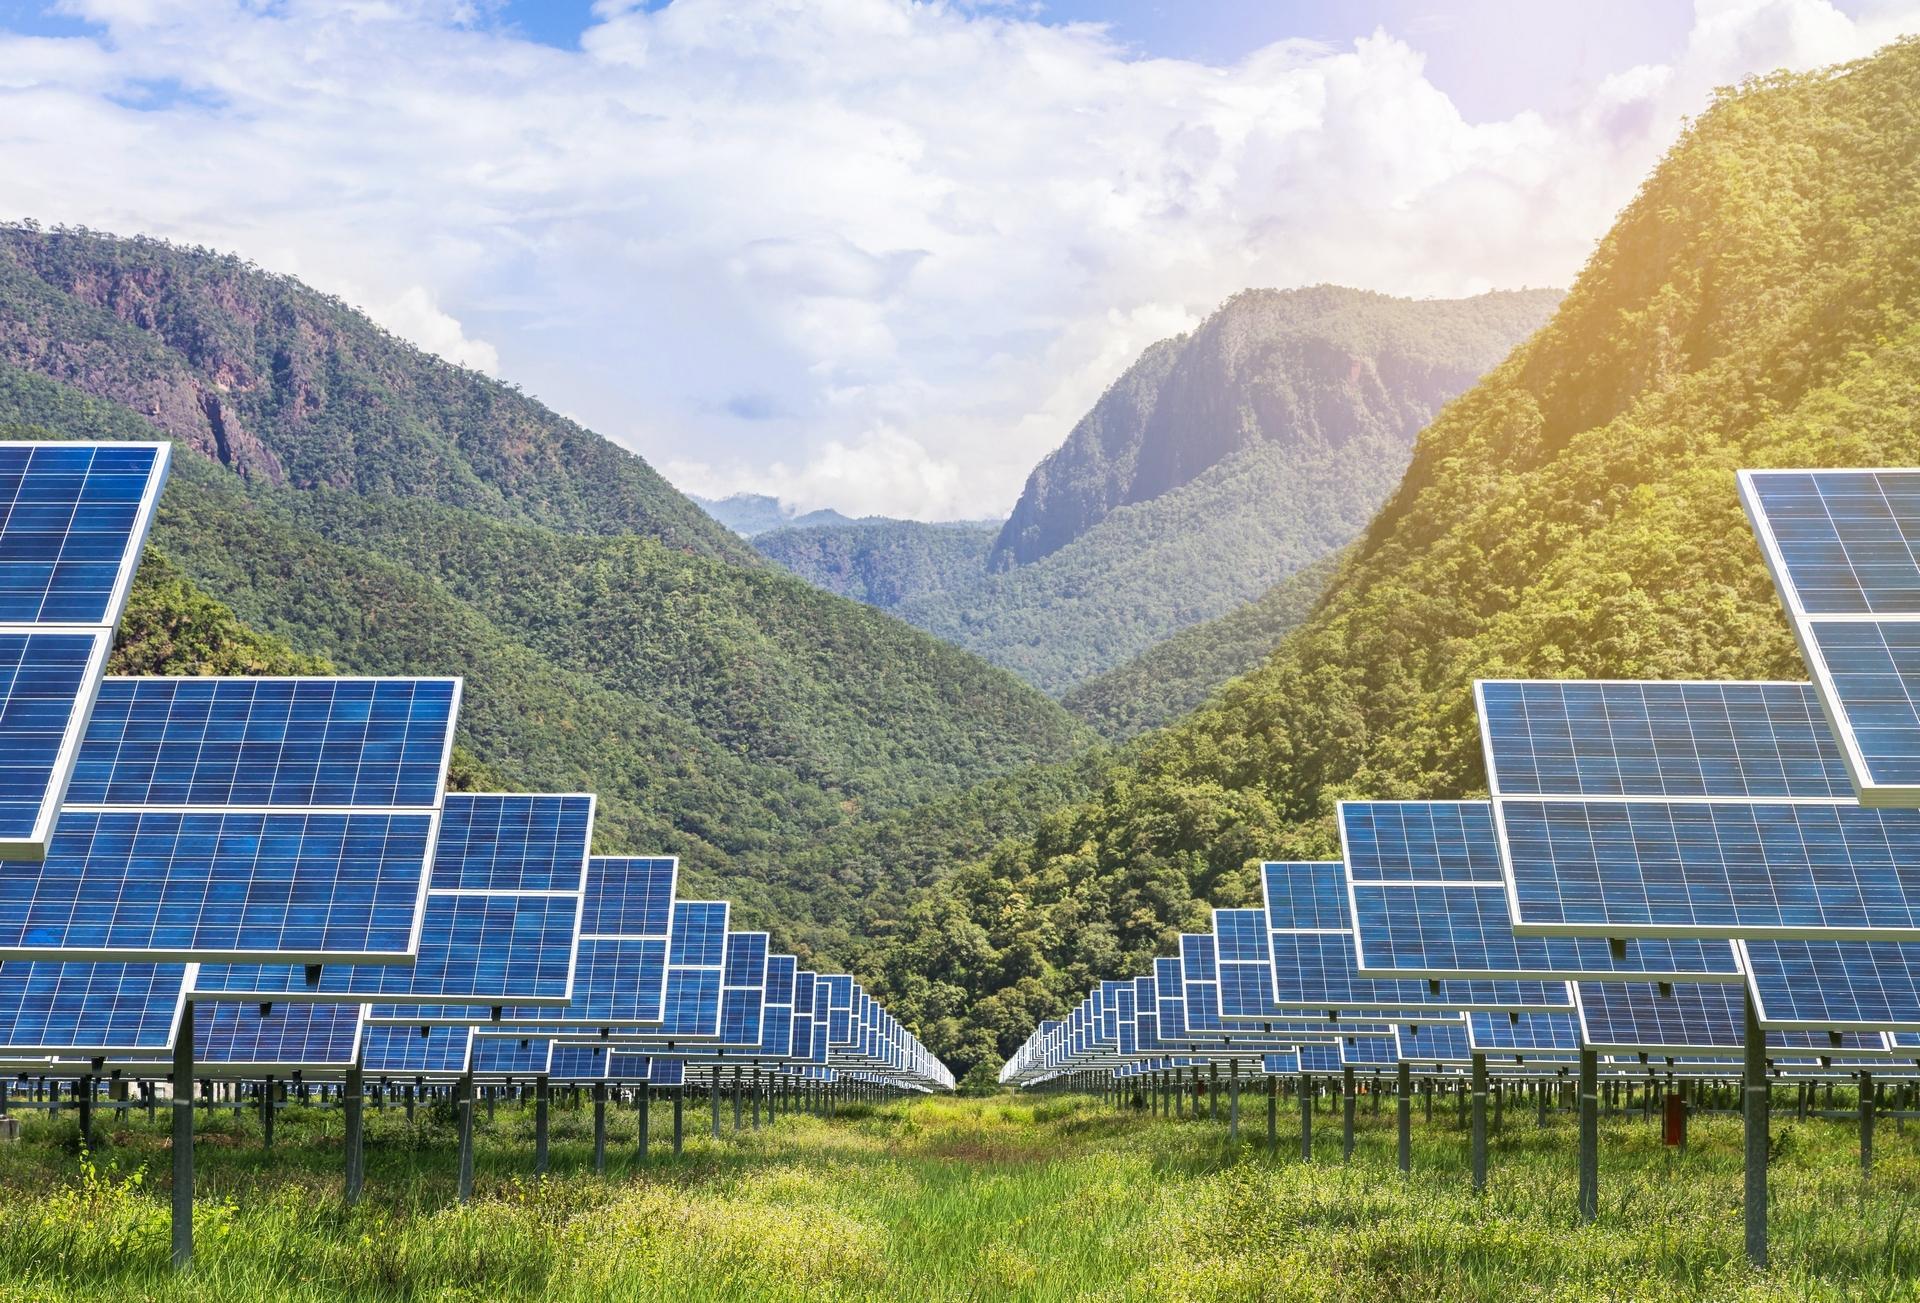 Solar array (Thinkstock image)